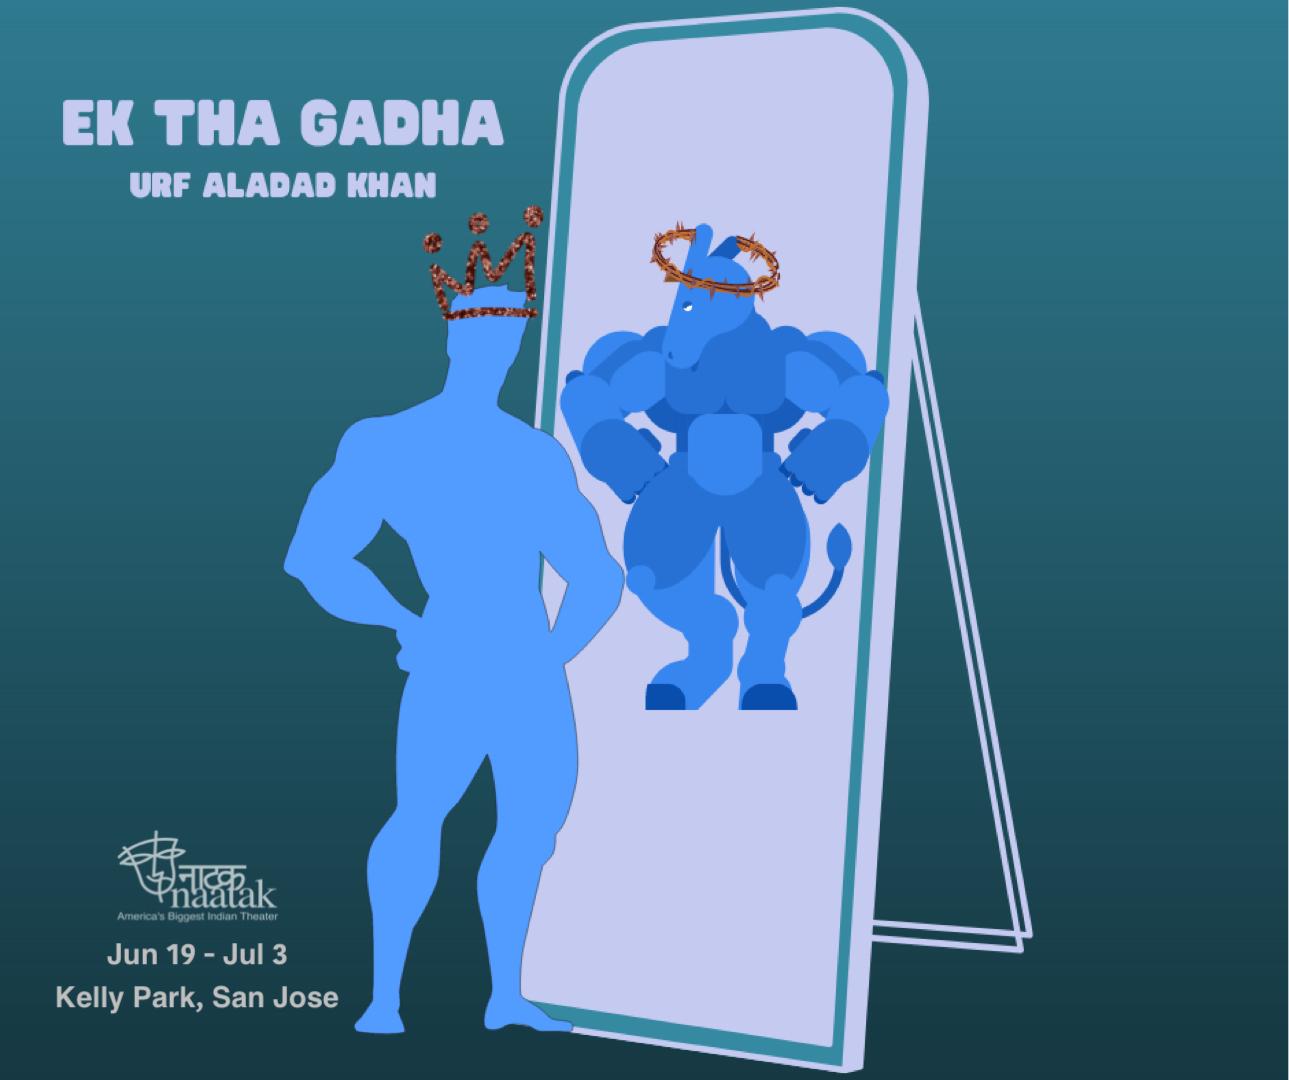 Ek Tha Gadha Uro Aladad Khan